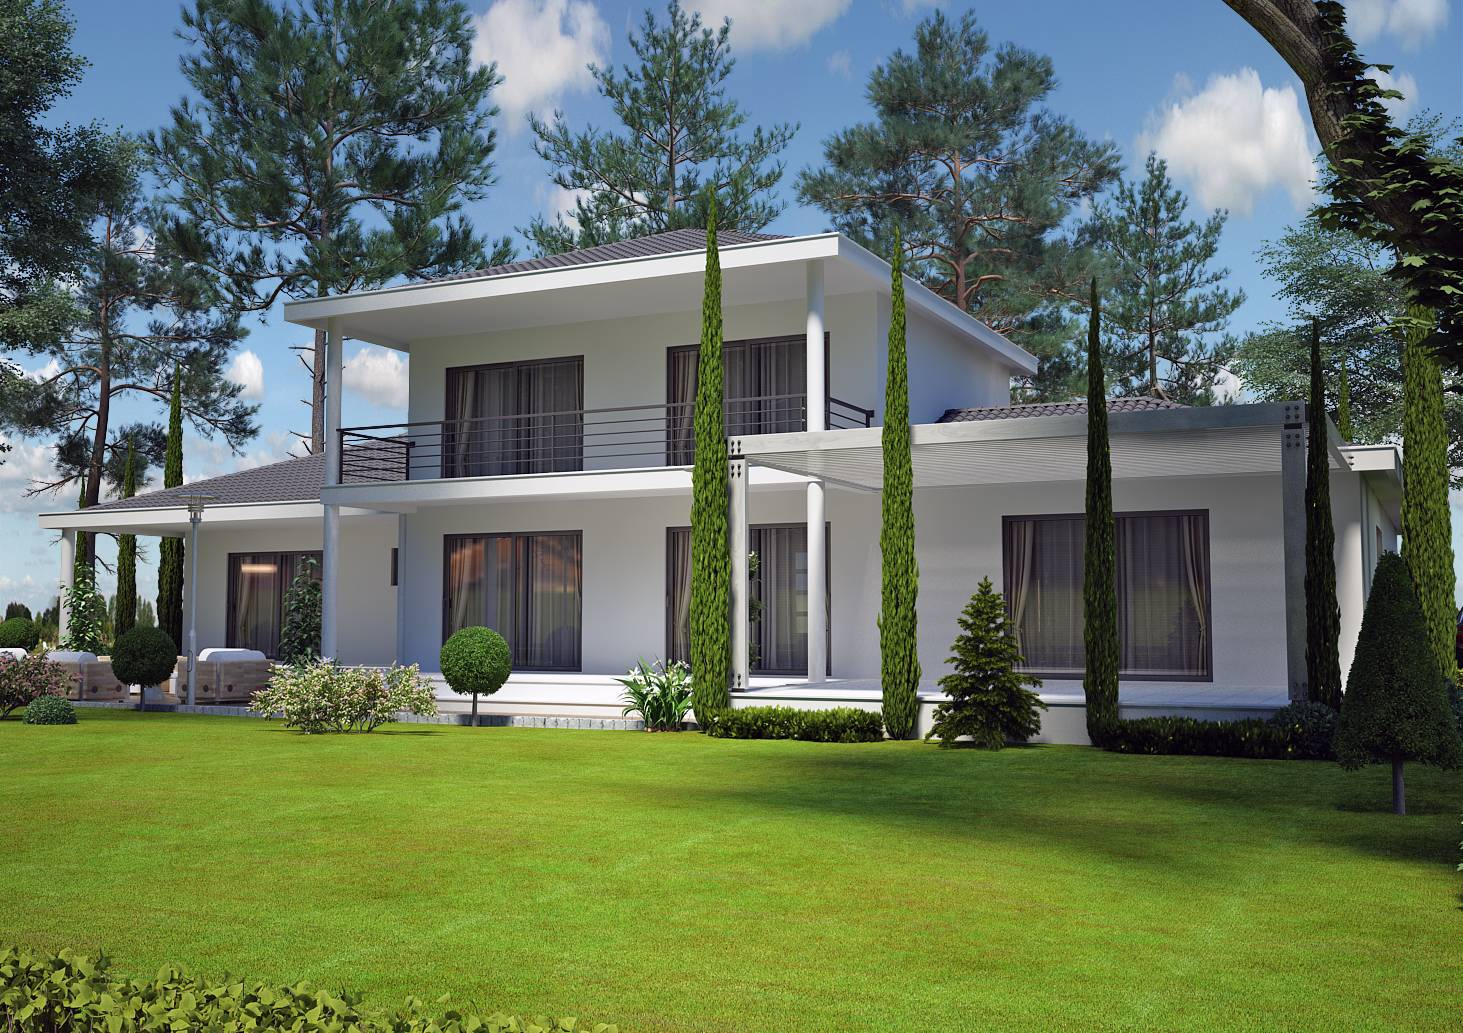 modele de maison moderne a etage maison fran ois fabie. Black Bedroom Furniture Sets. Home Design Ideas